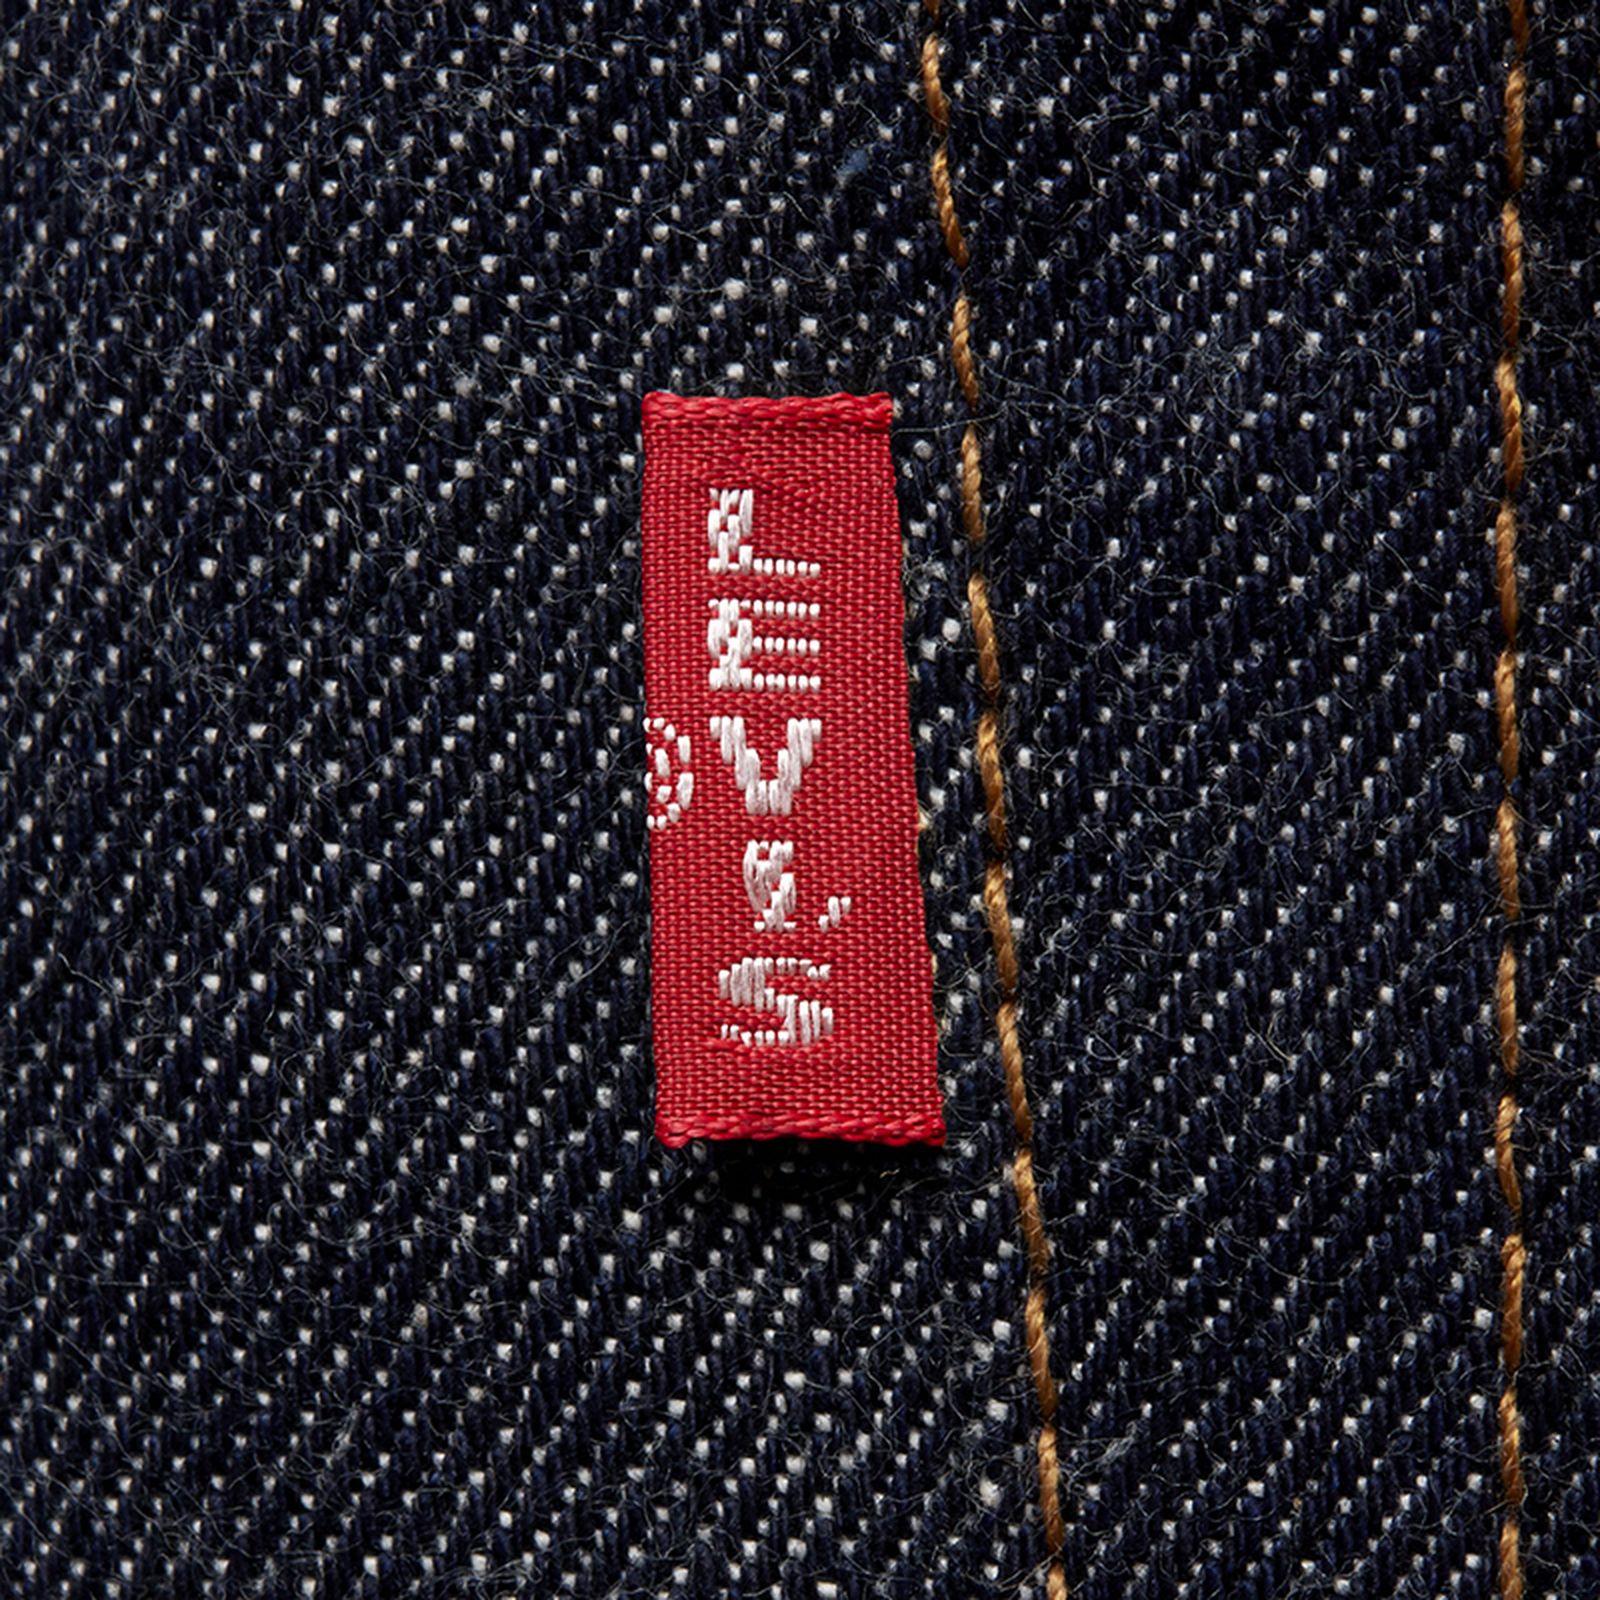 levis-golf-wang-501-day-1-02